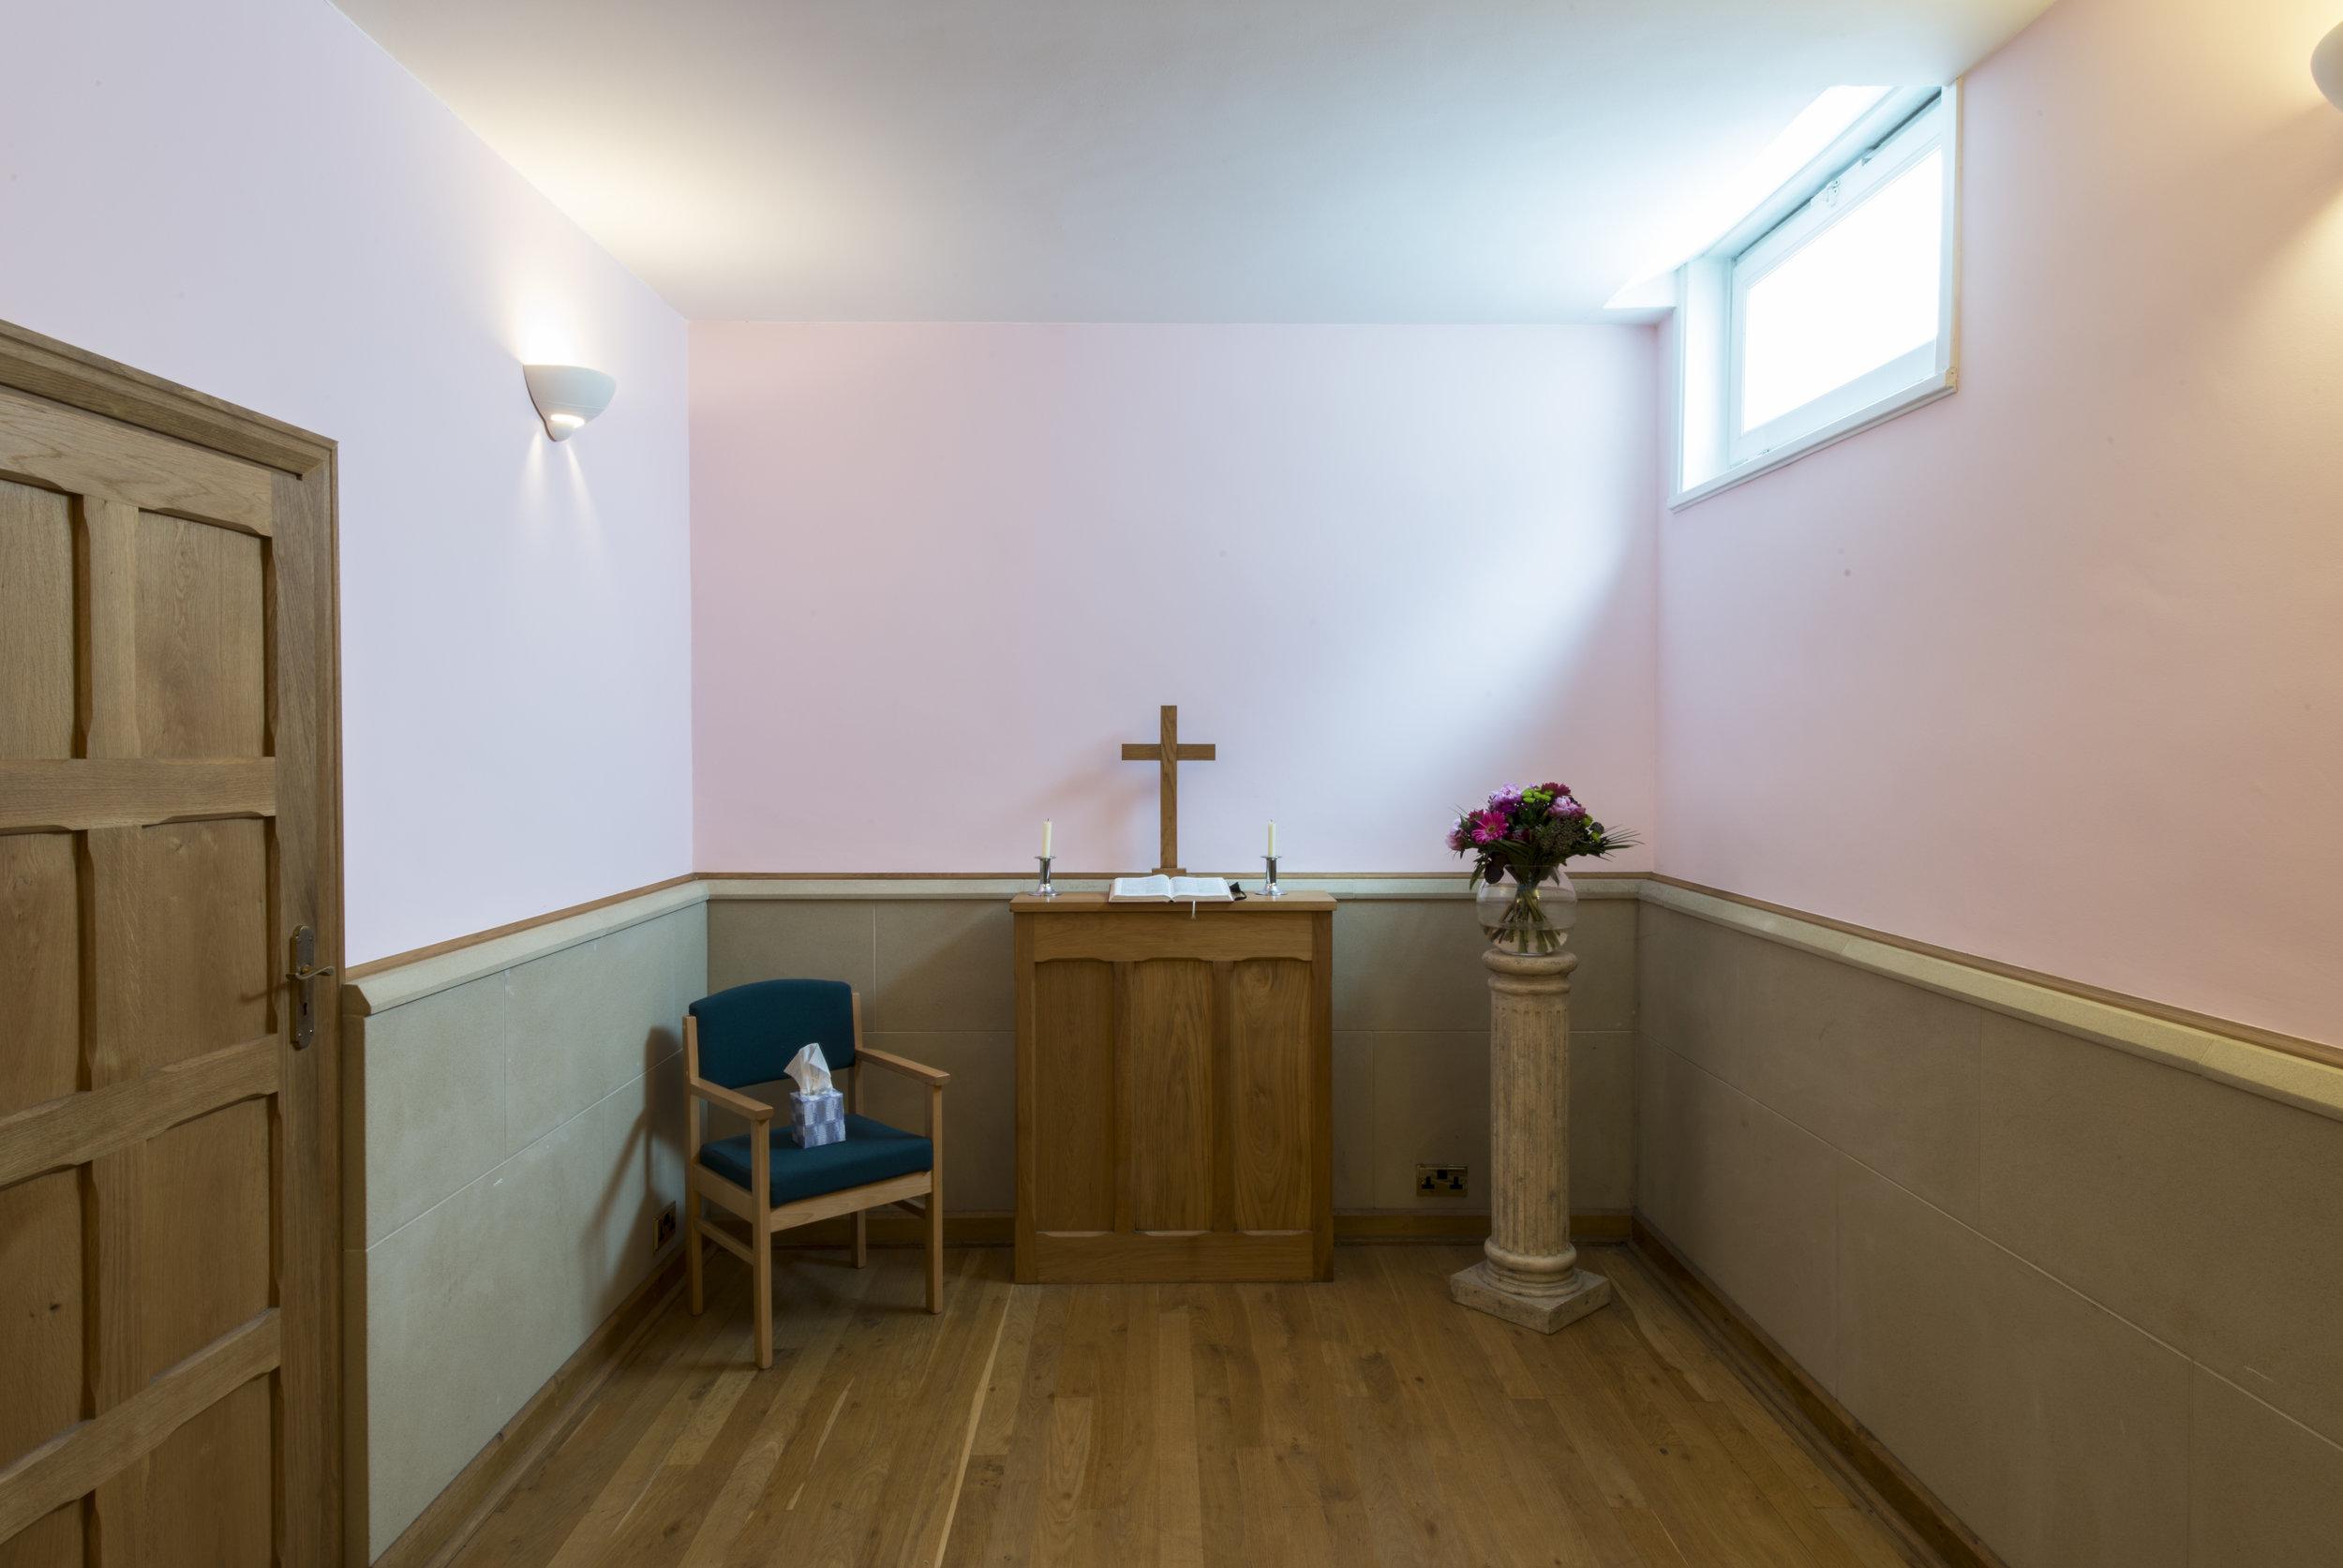 Chapel of Rest, 2013